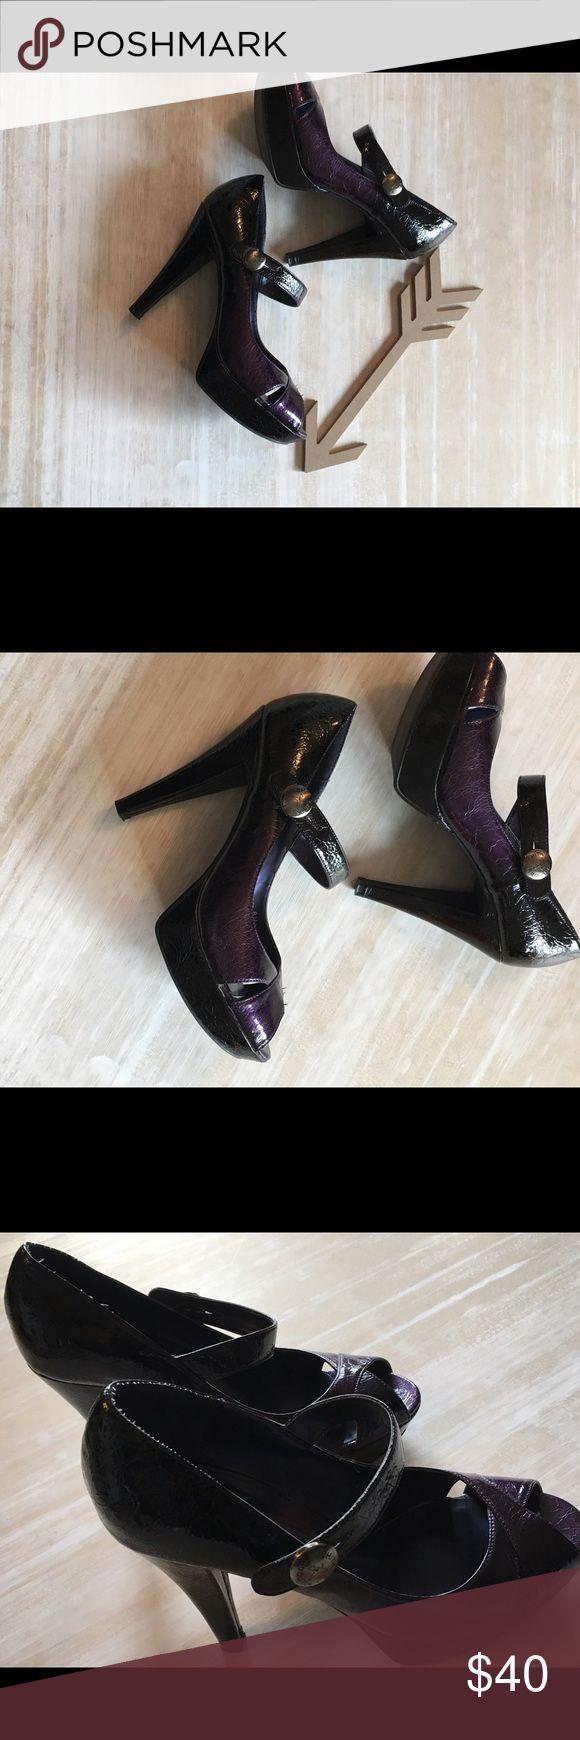 BNWT black and purple Chinese Laundry heels Black fades into purple heels Chinese Laundry Shoes Heels